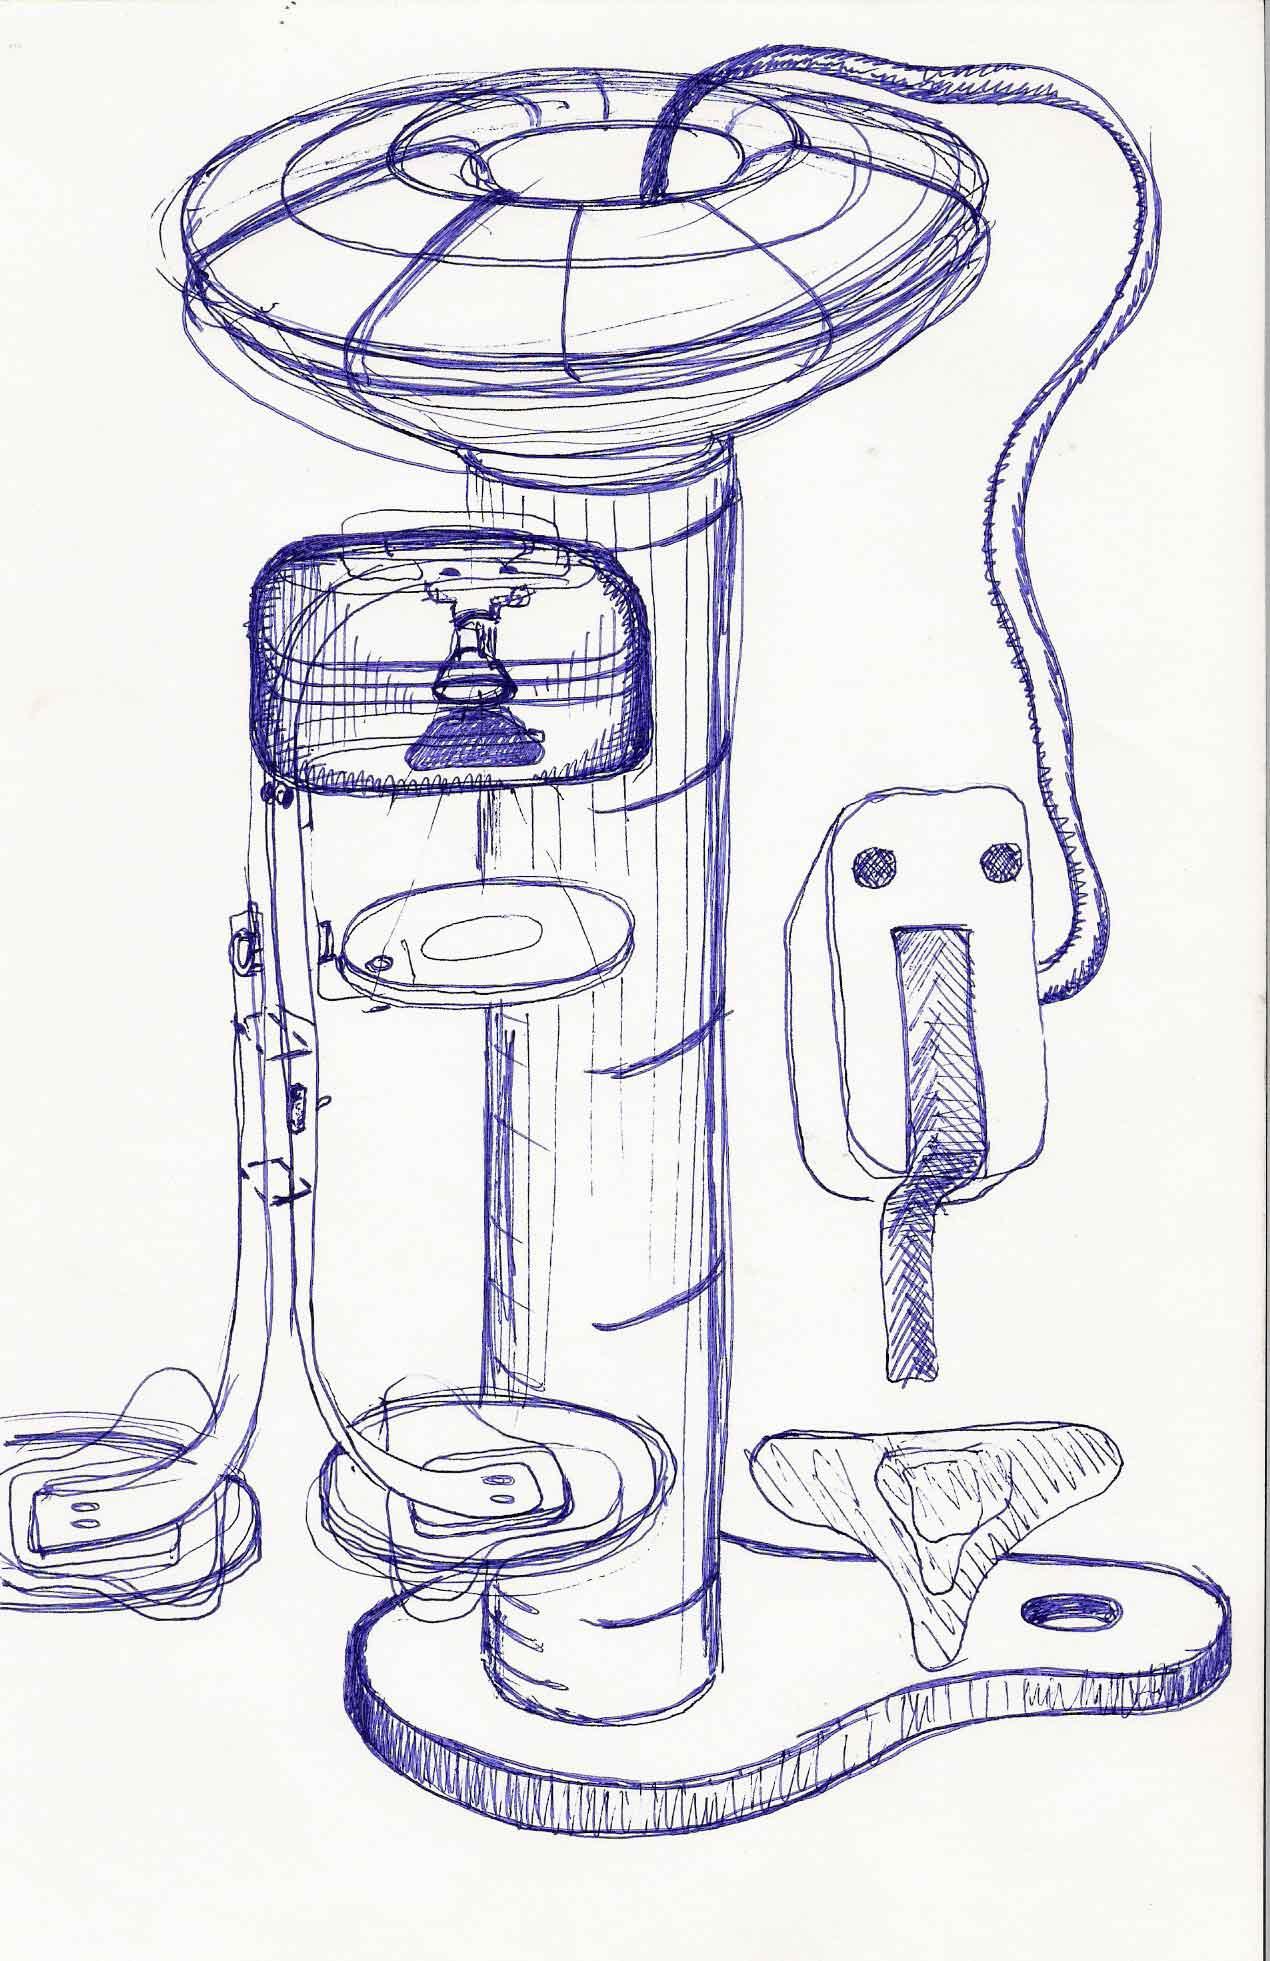 sketch-54-sept-05.jpg